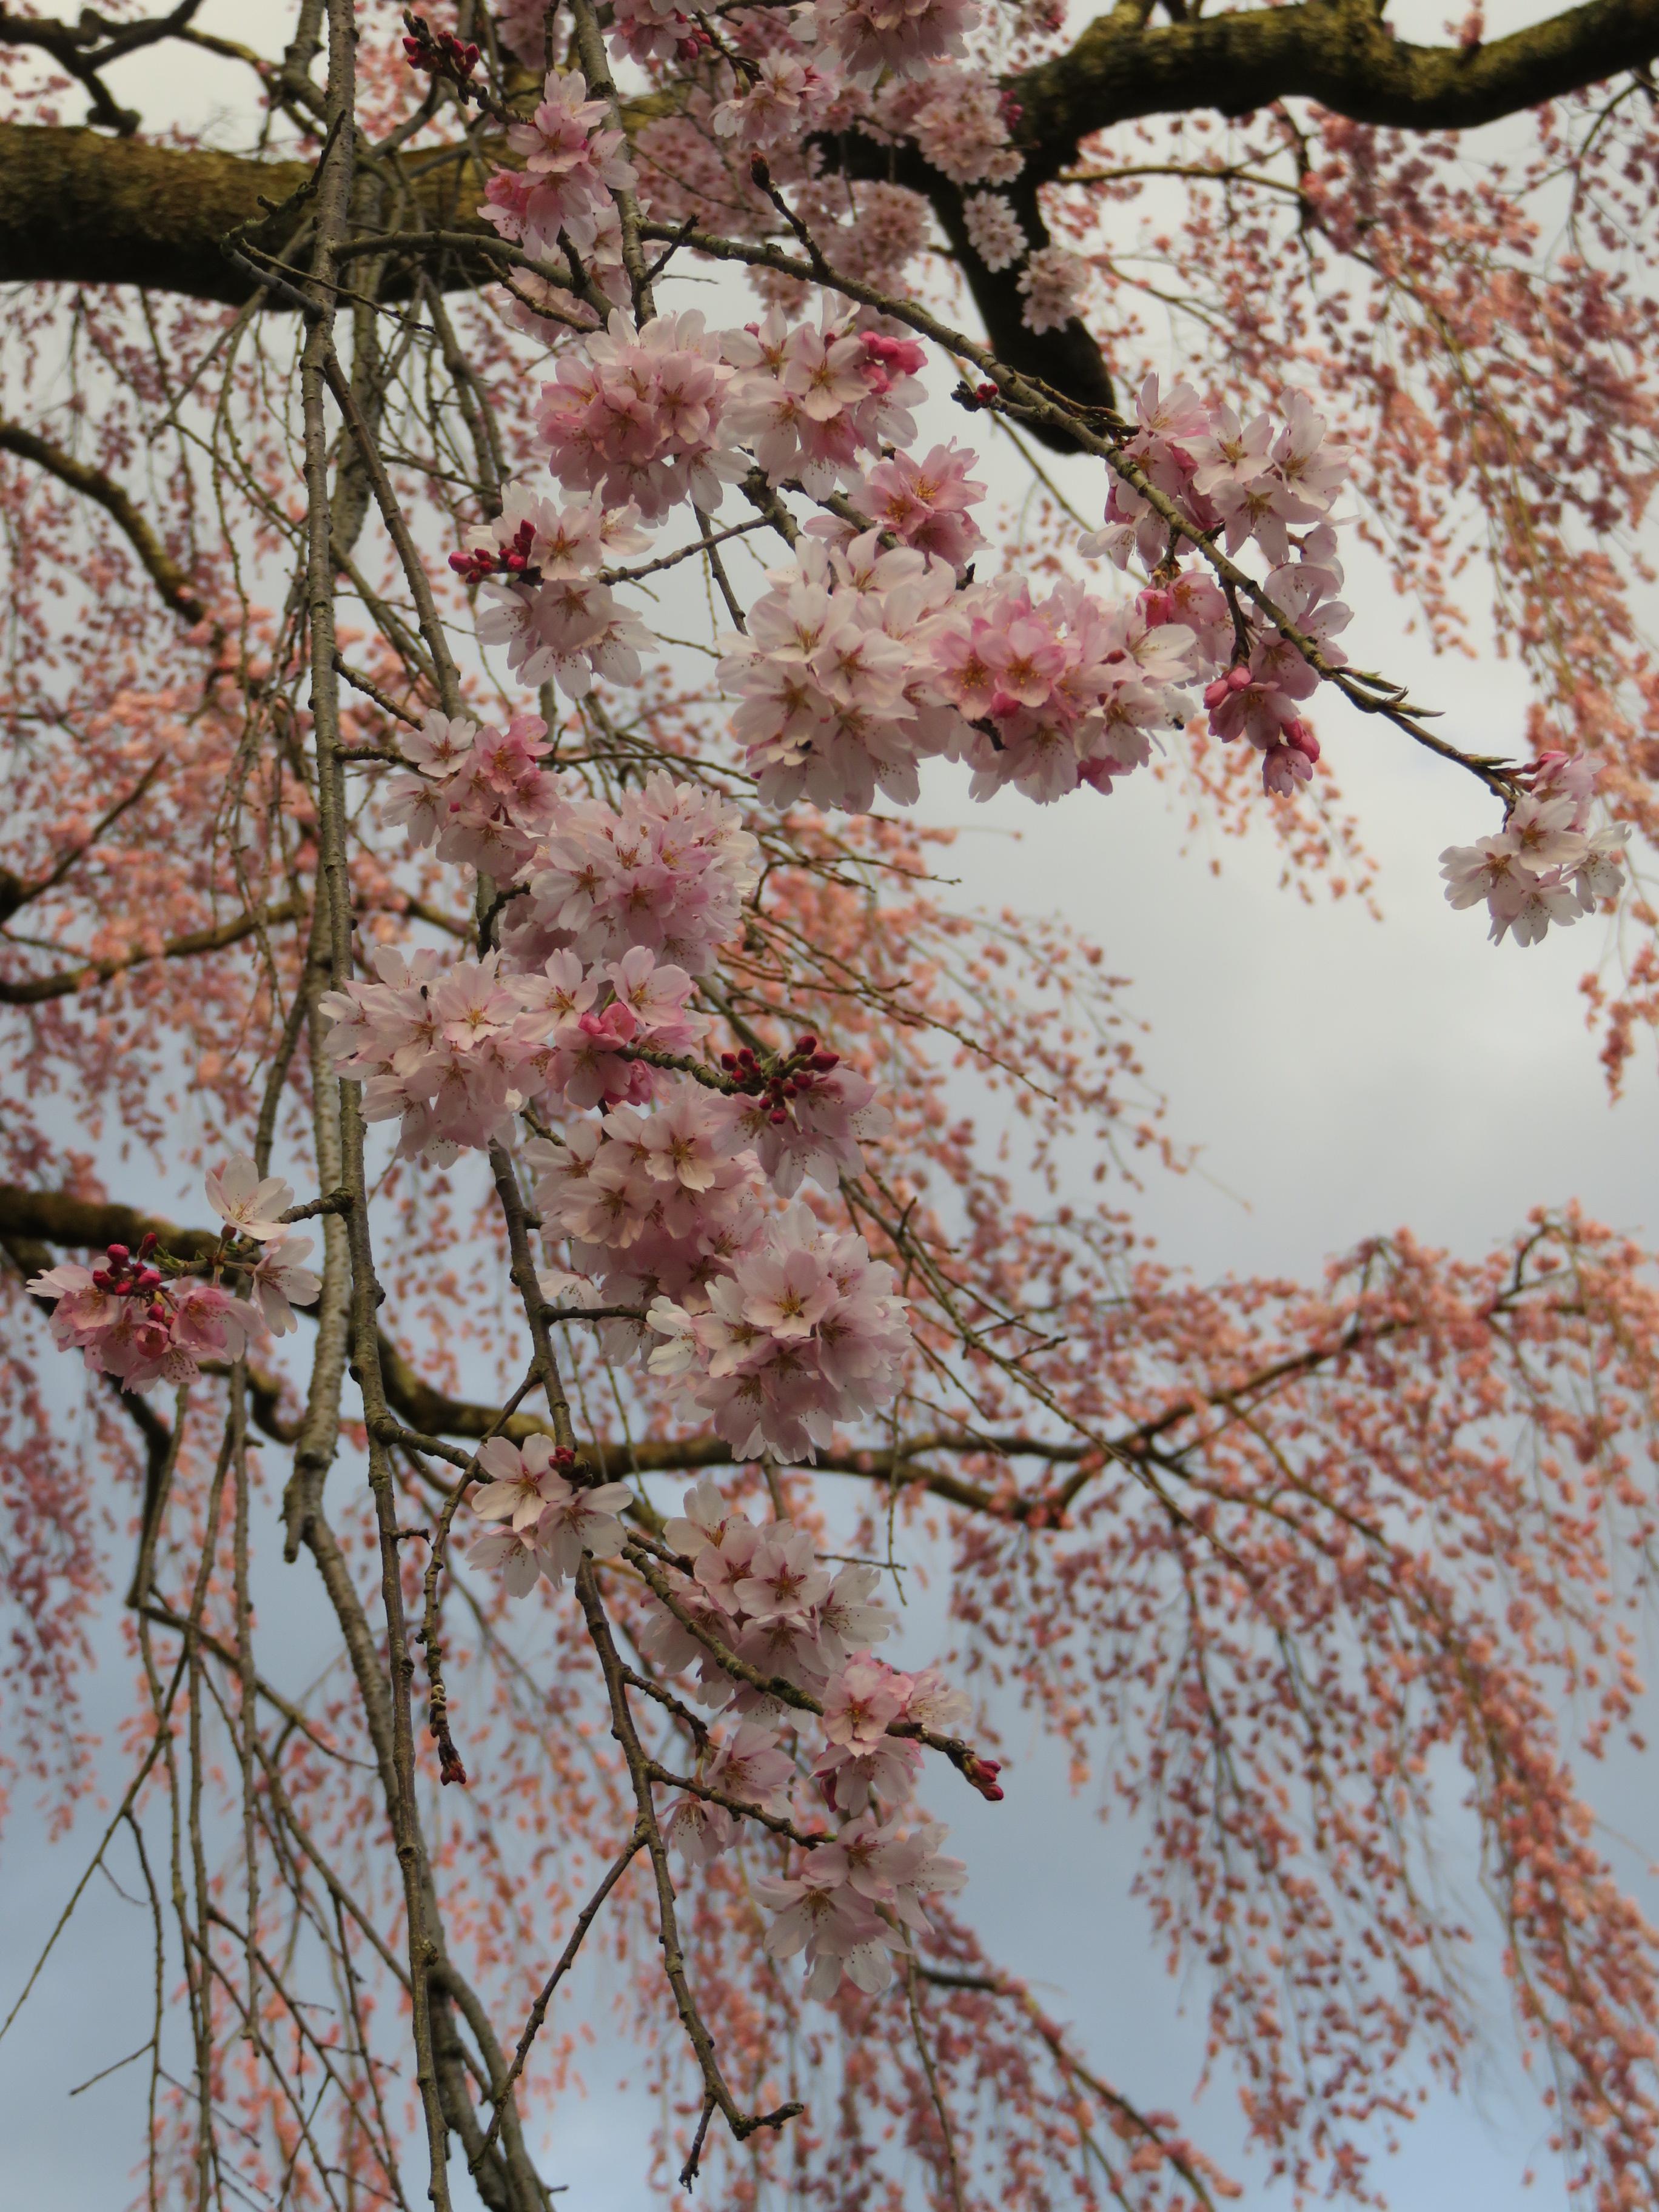 H29.4.16 氏乗枝垂れ桜3